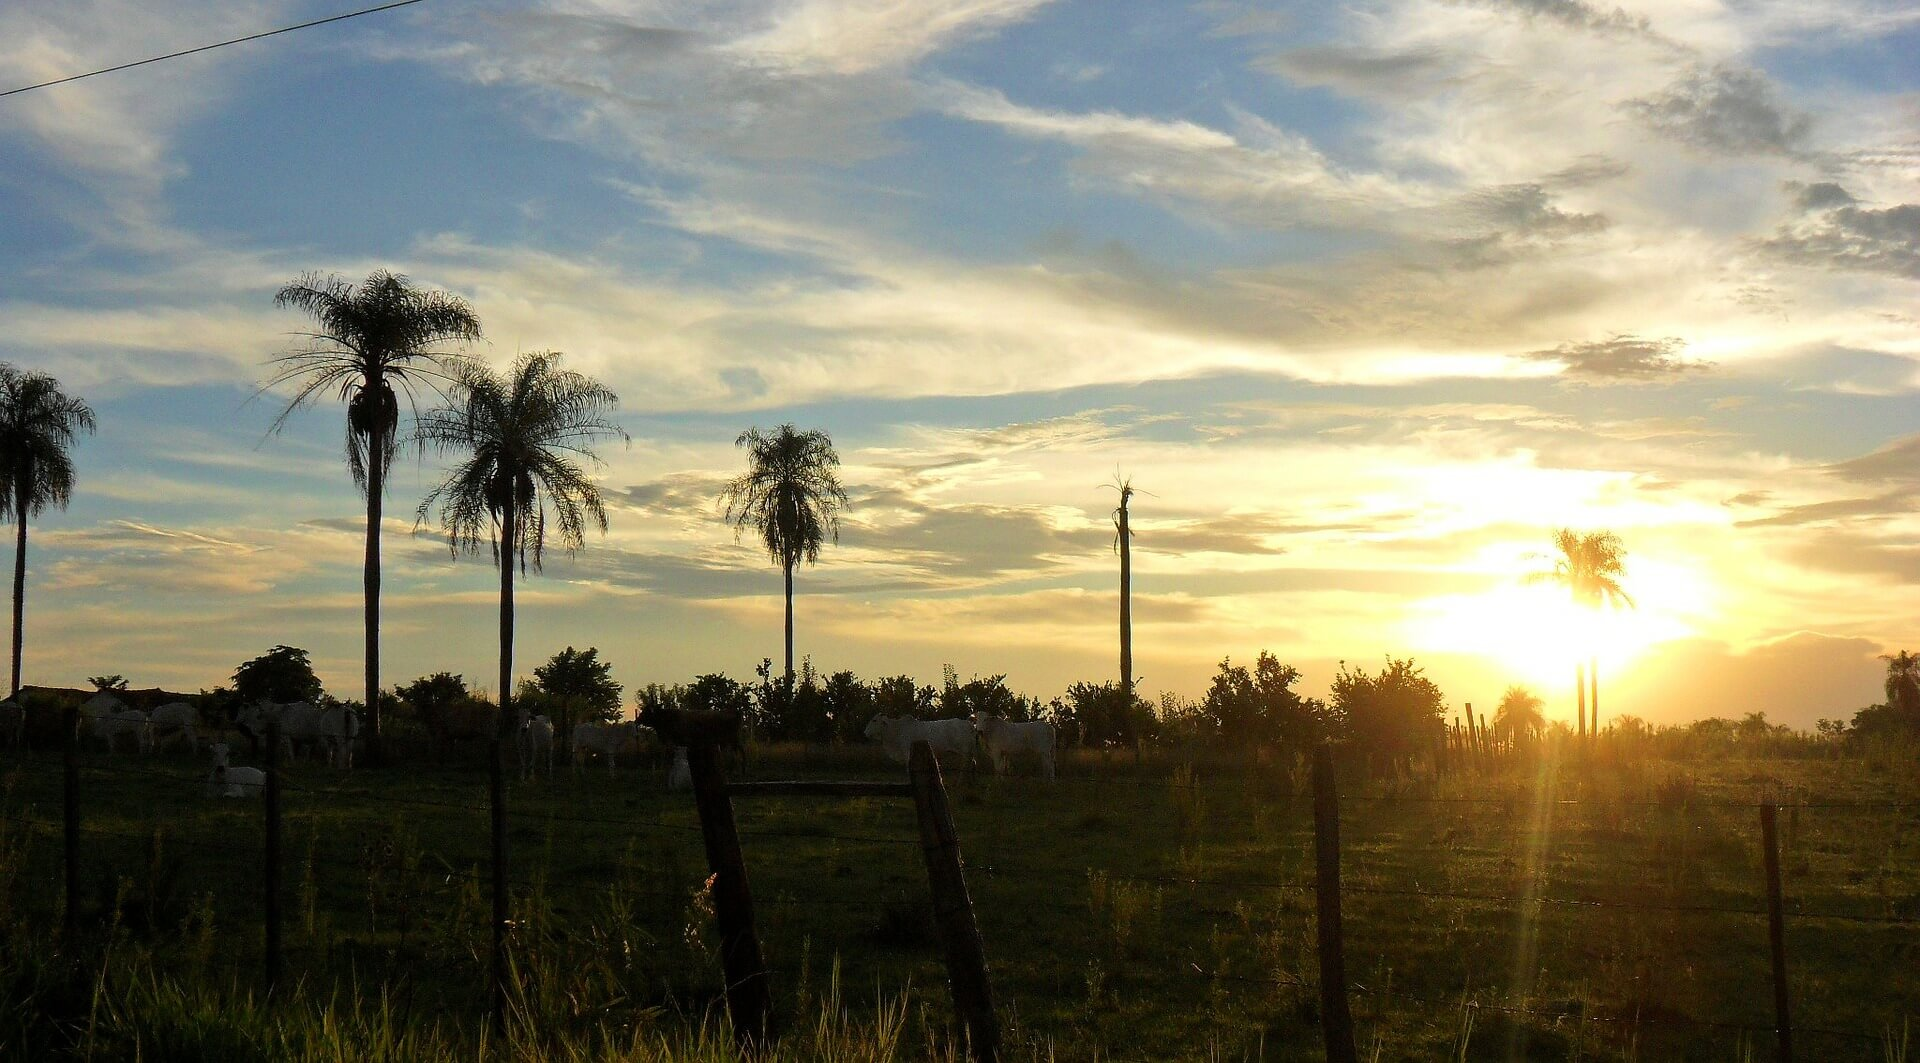 sunset in Paraguay Auslandspraktikum